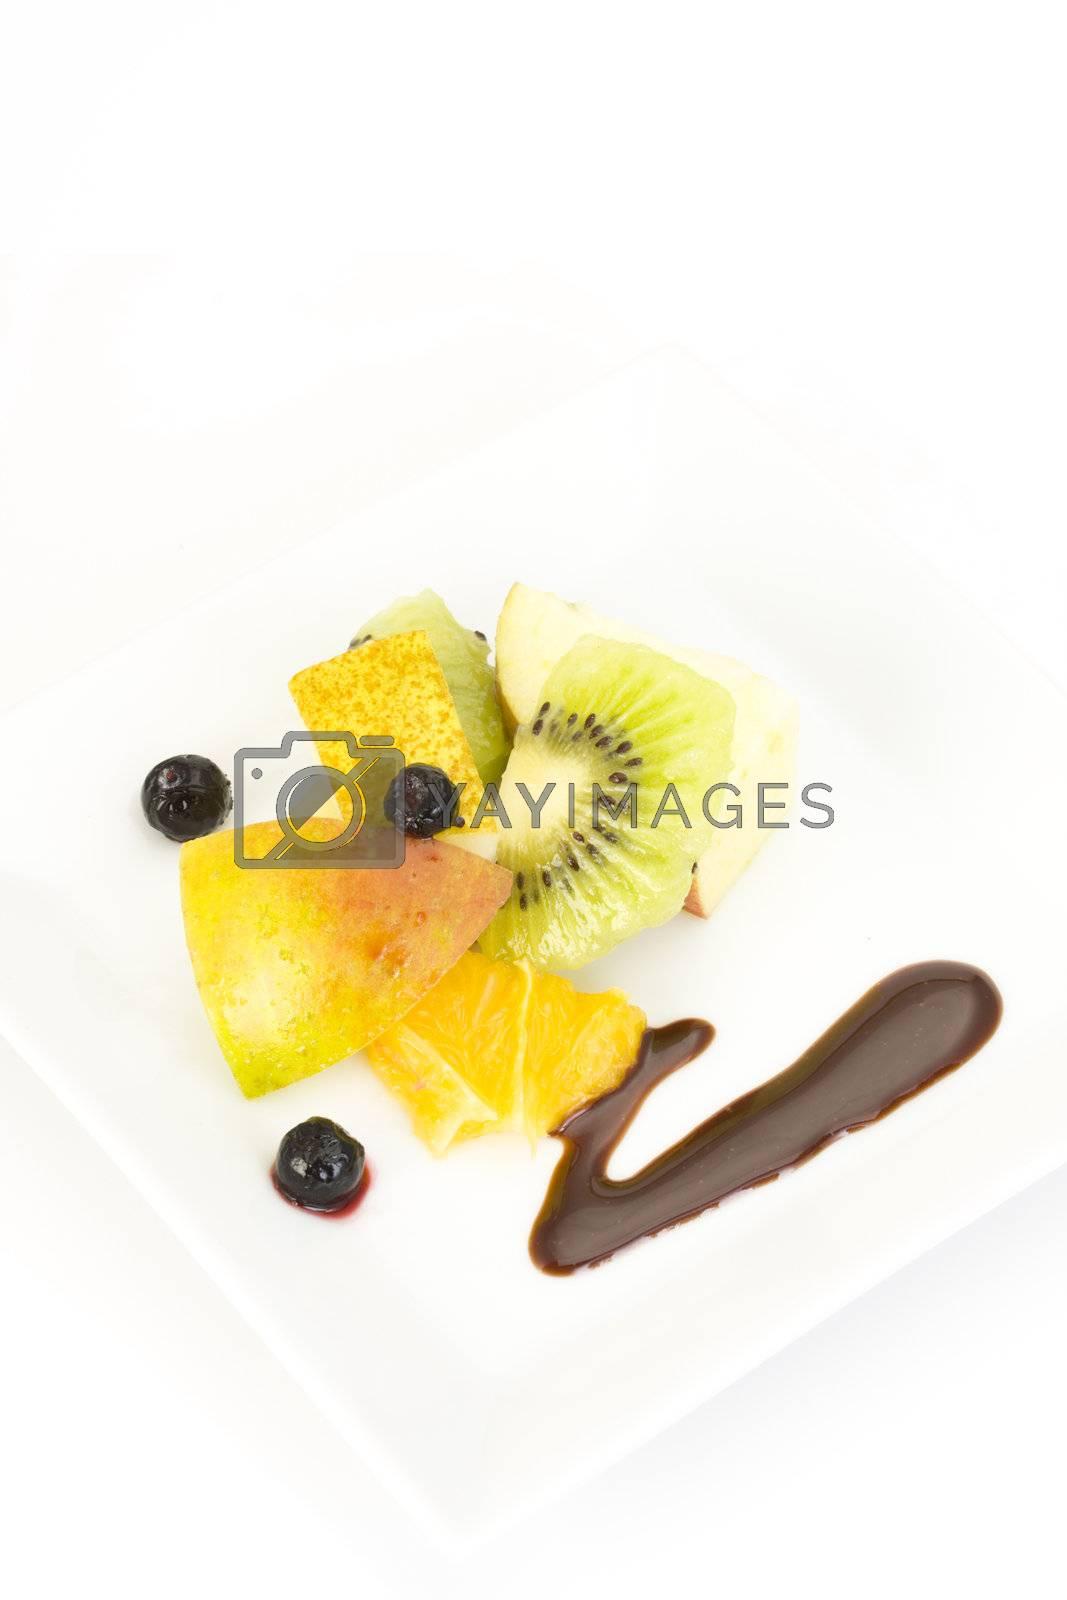 fruit salad composed of kiwi, orange, apple, lime and lemon slices